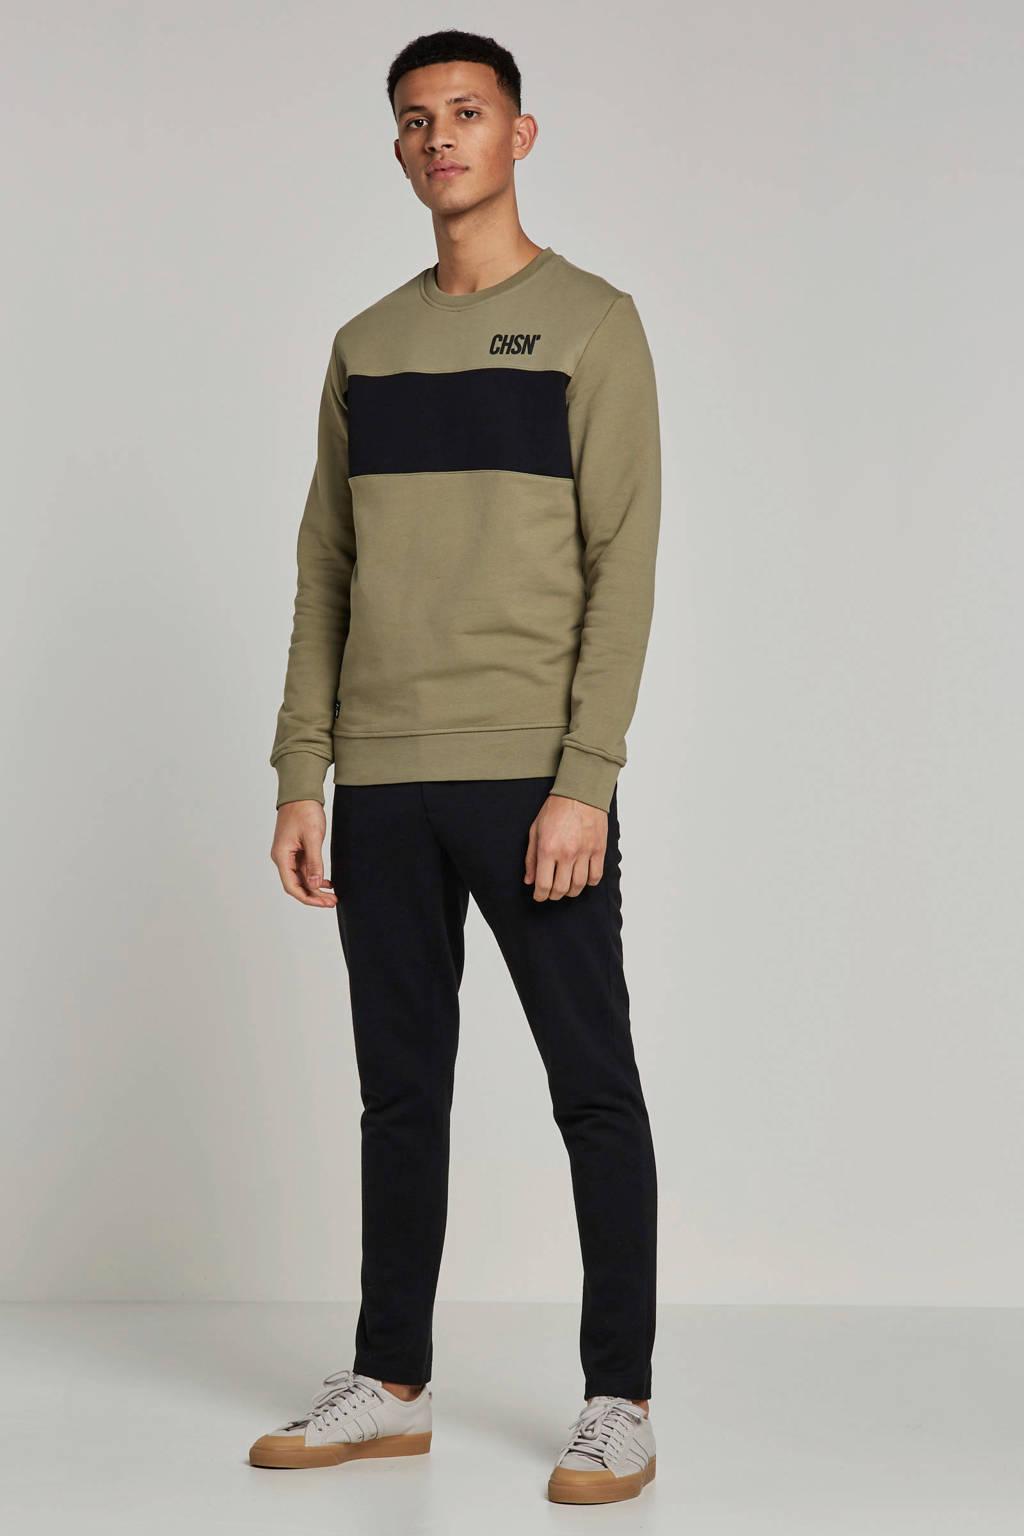 Chasin' sweater, Kaki